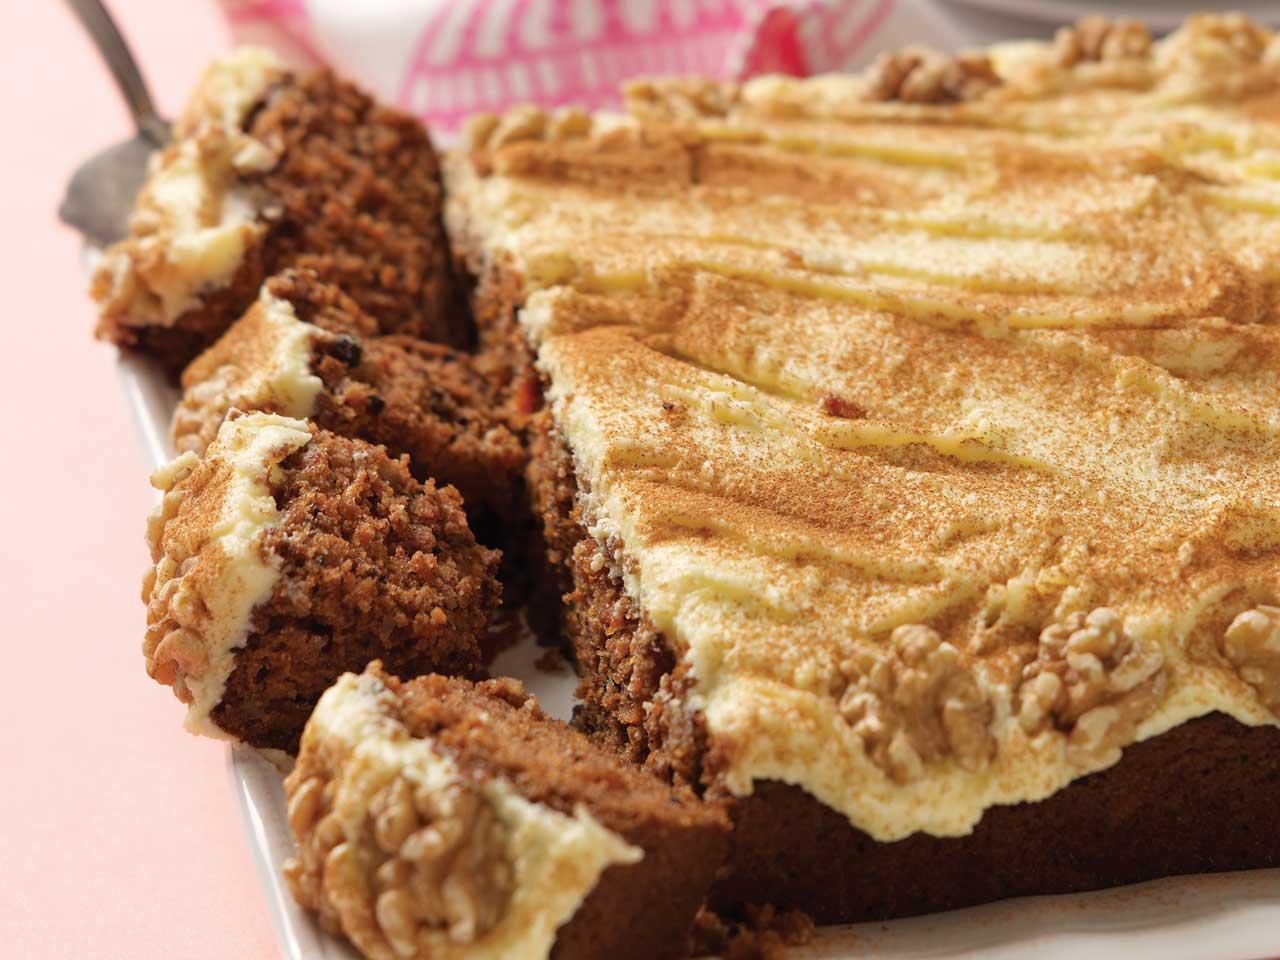 Gluten Free Carrot Cake Recipe — Dishmaps